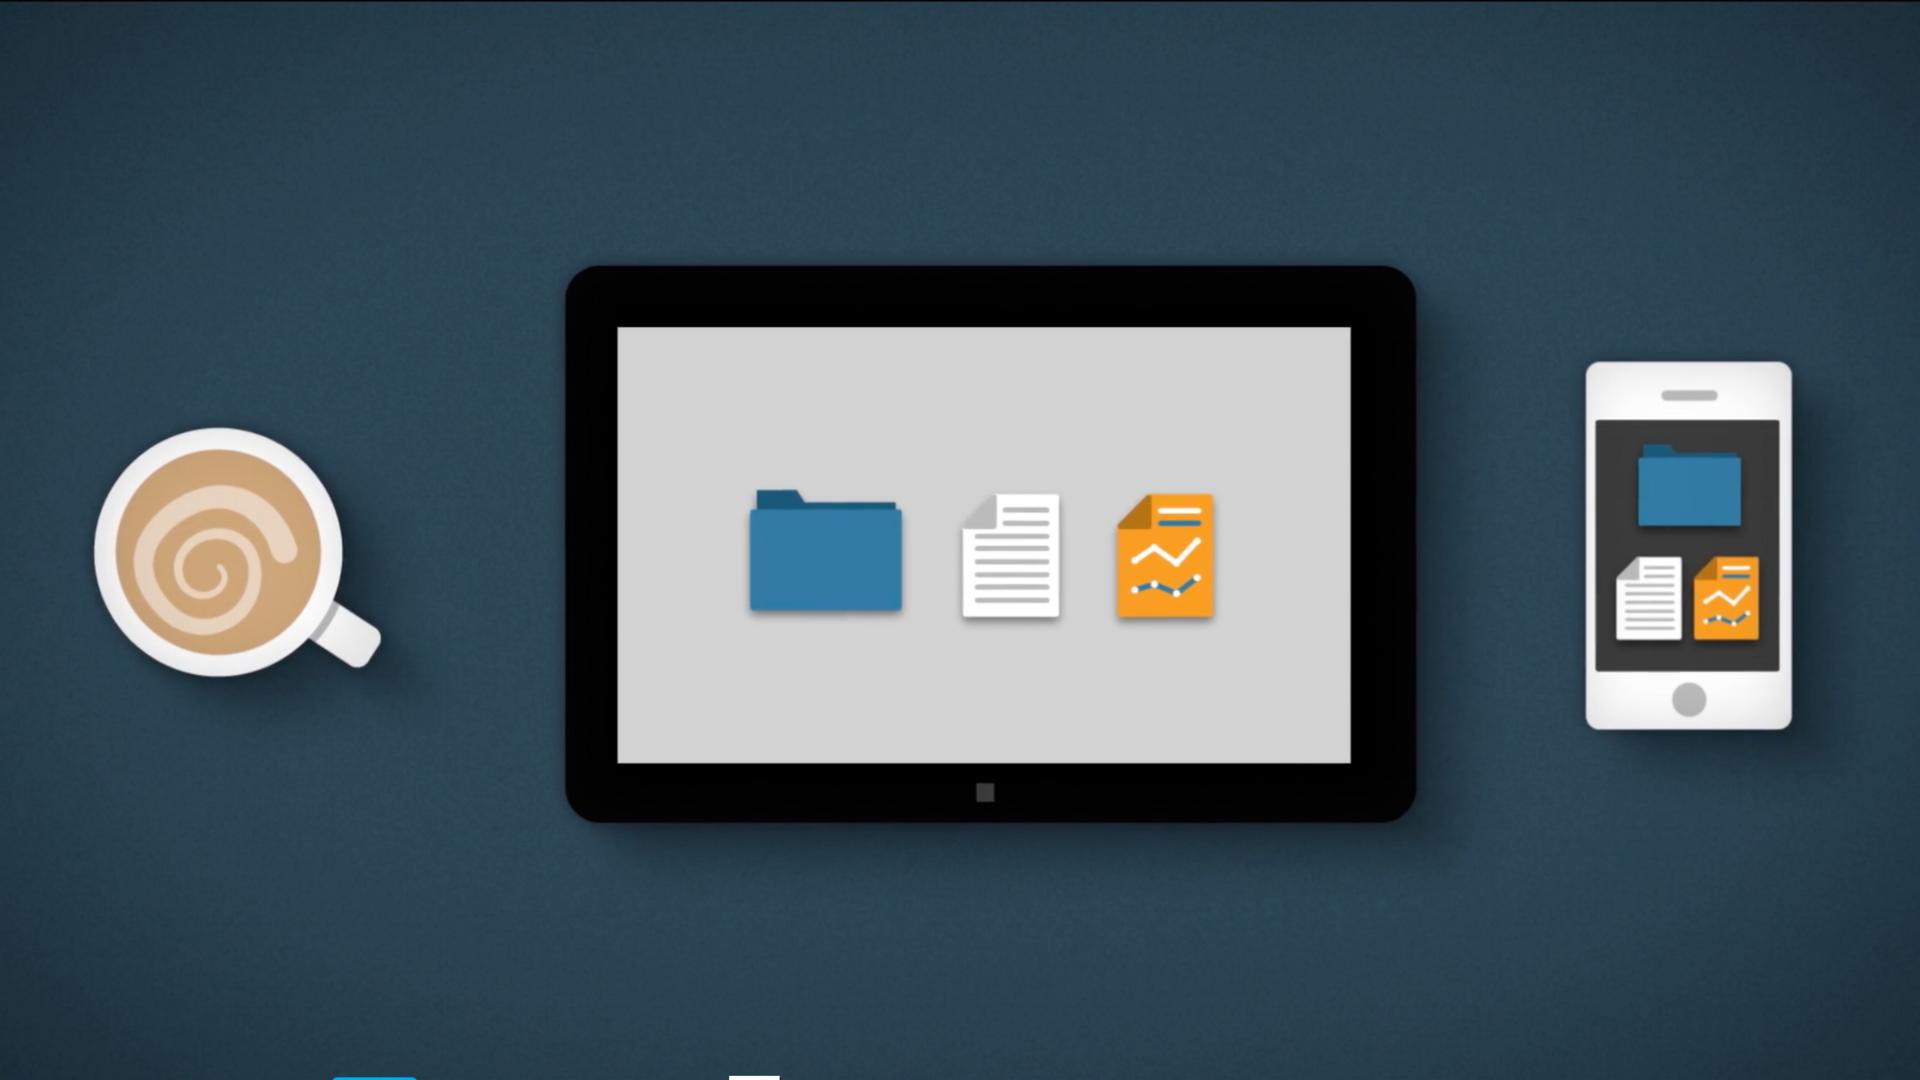 Files Anywhere